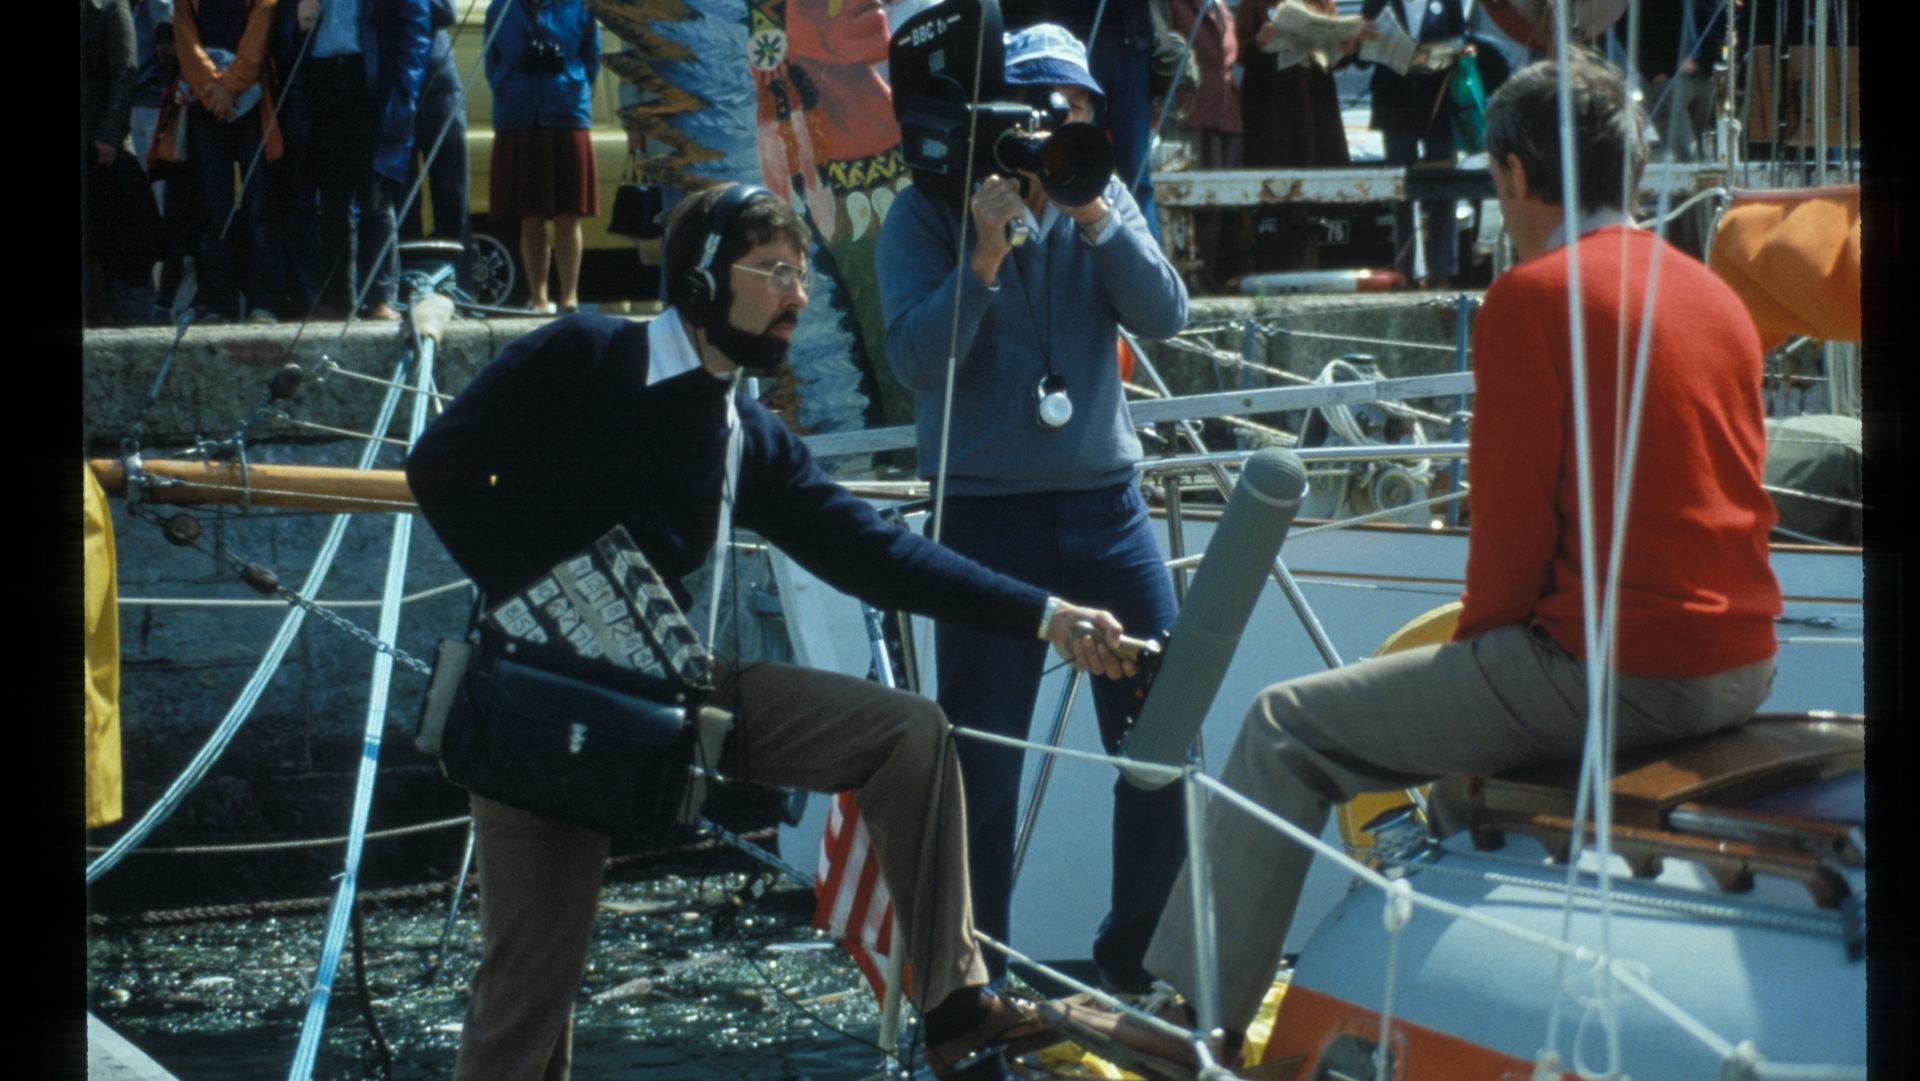 4.2 tape recorder journalist sailor bateau reportage